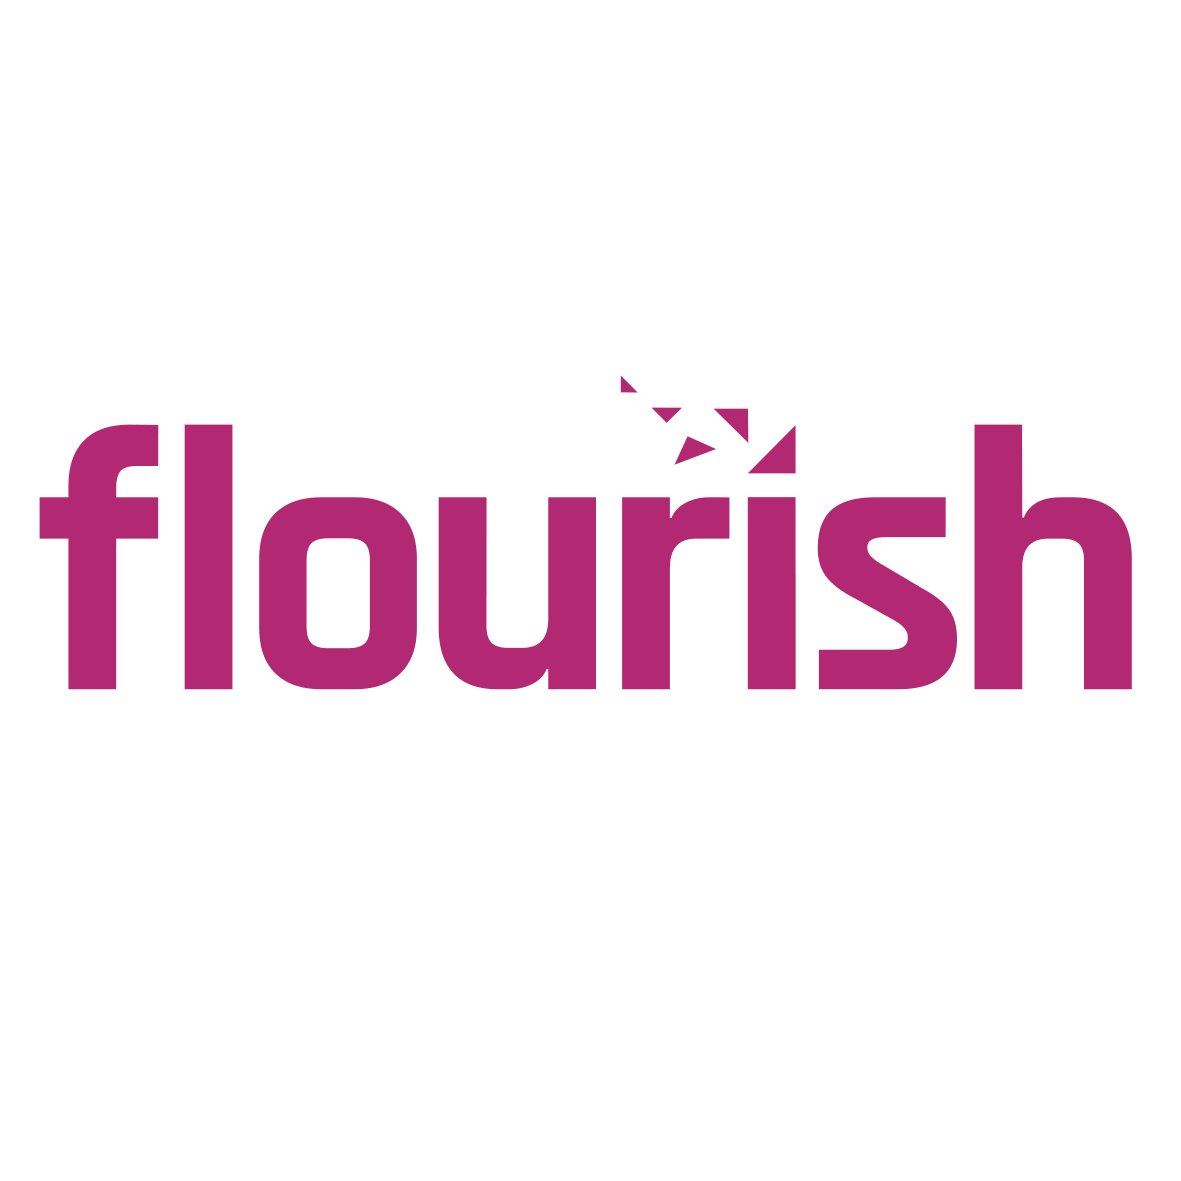 @FlourishCIC